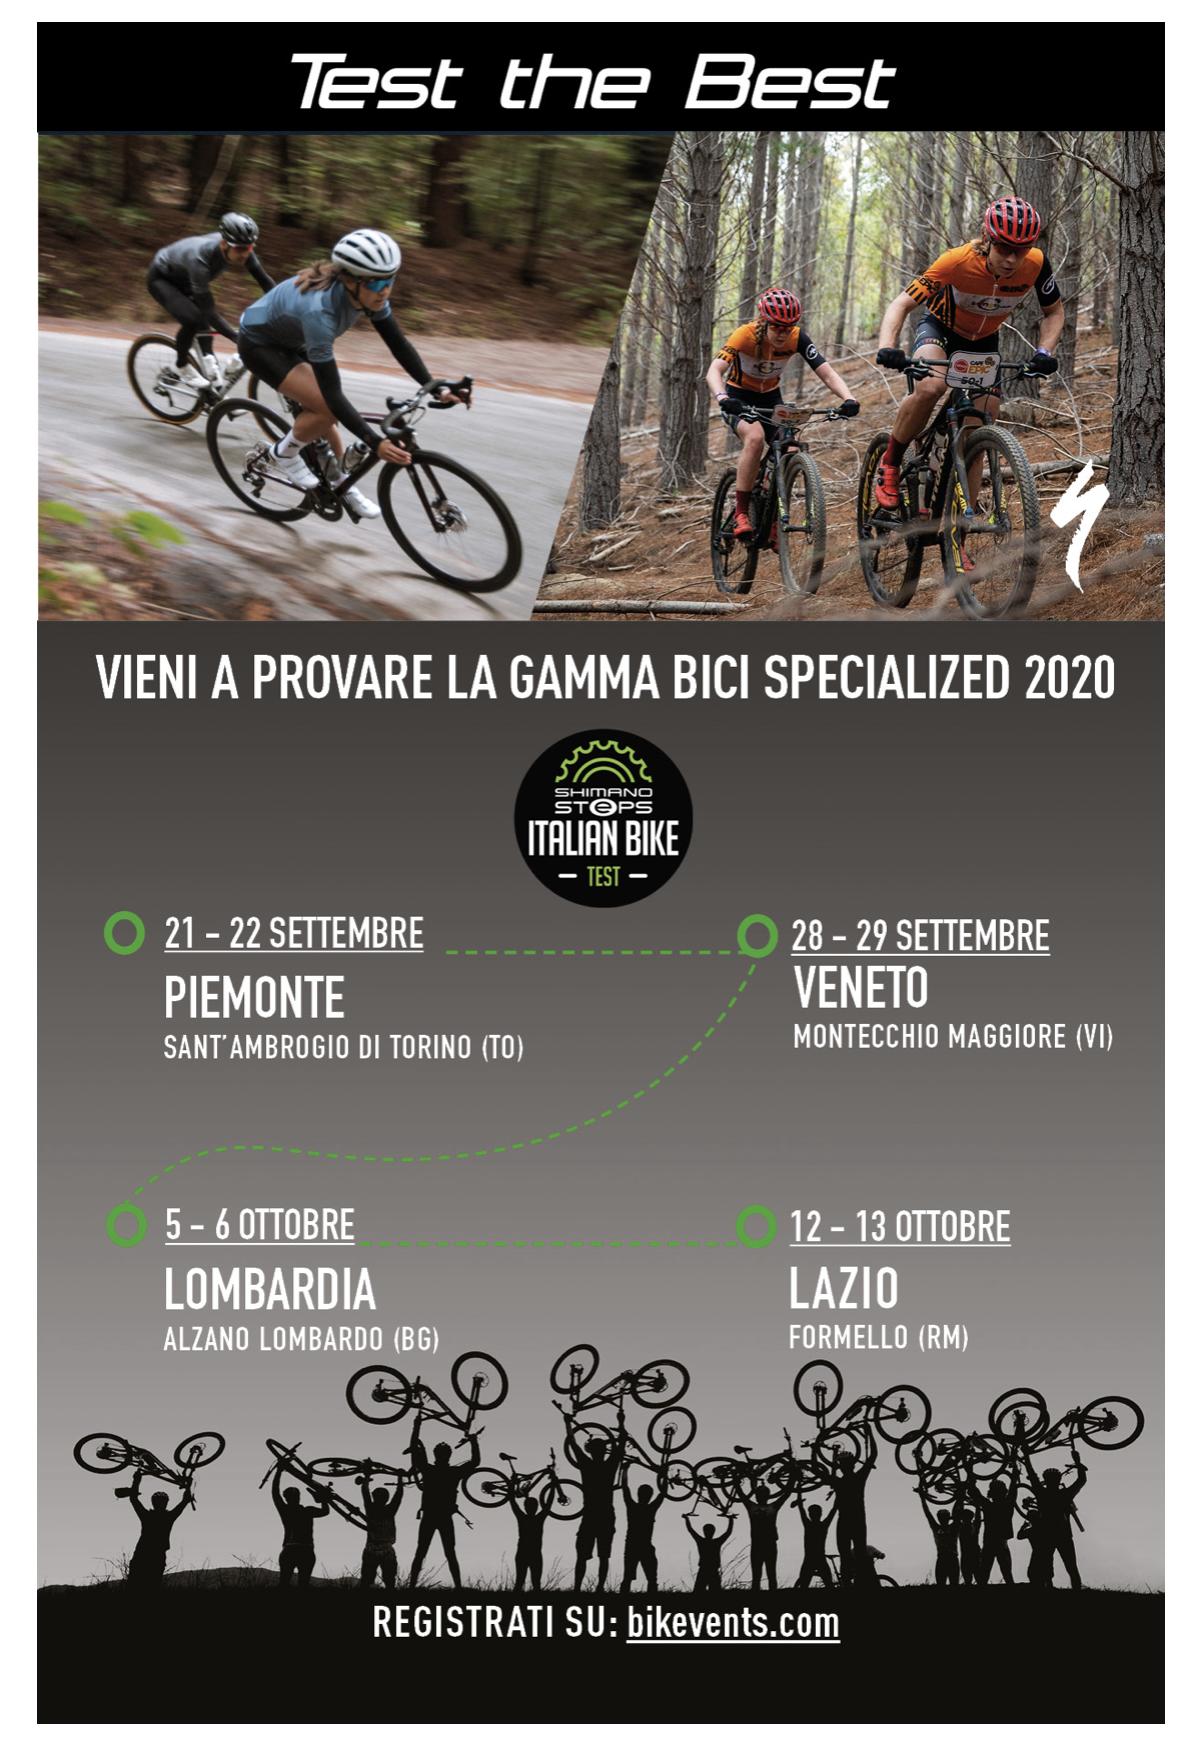 provare le bici Specialized 2020